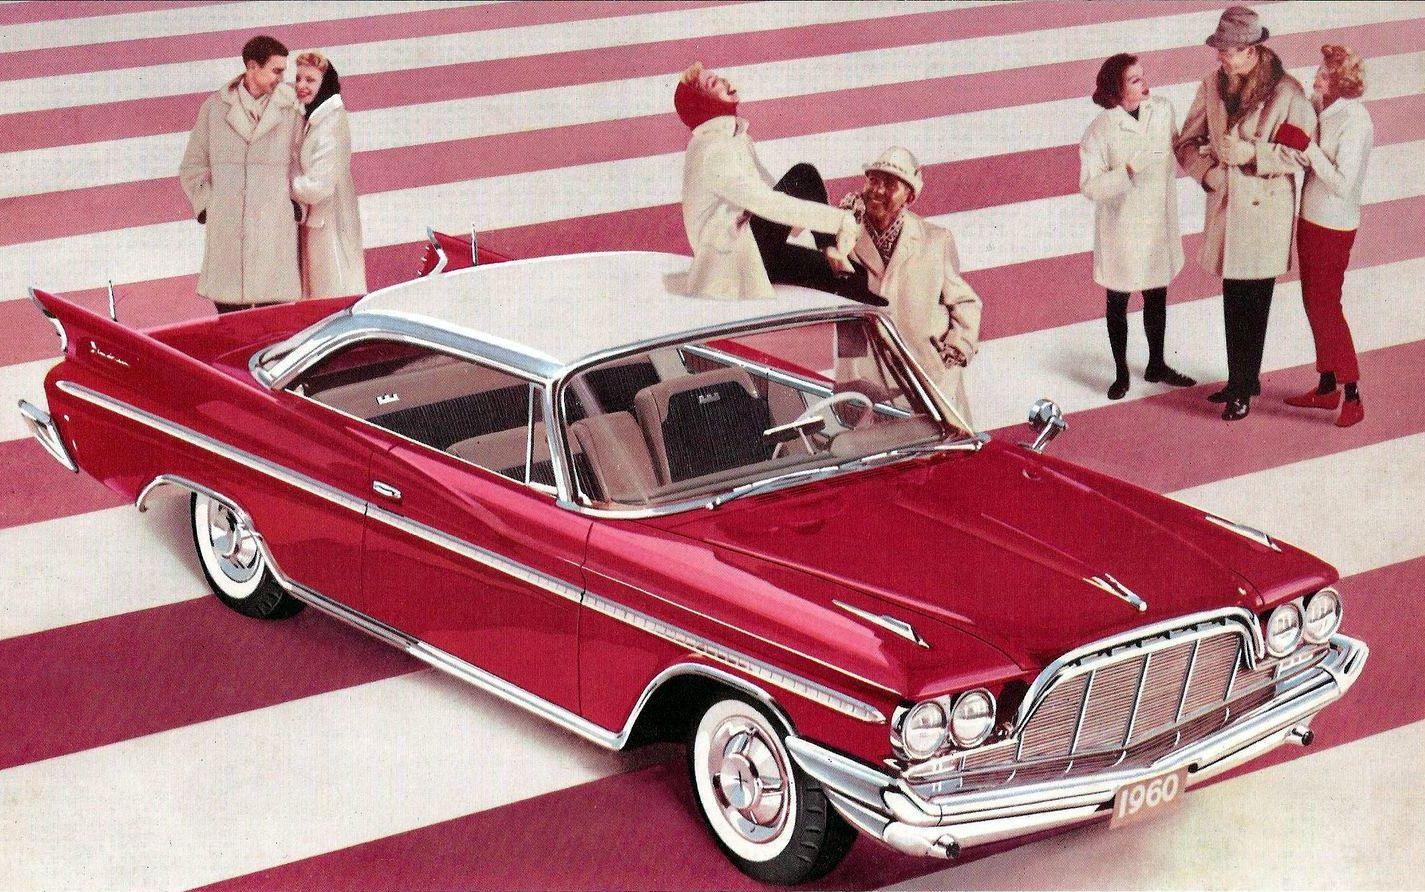 1960 Desoto advertisement